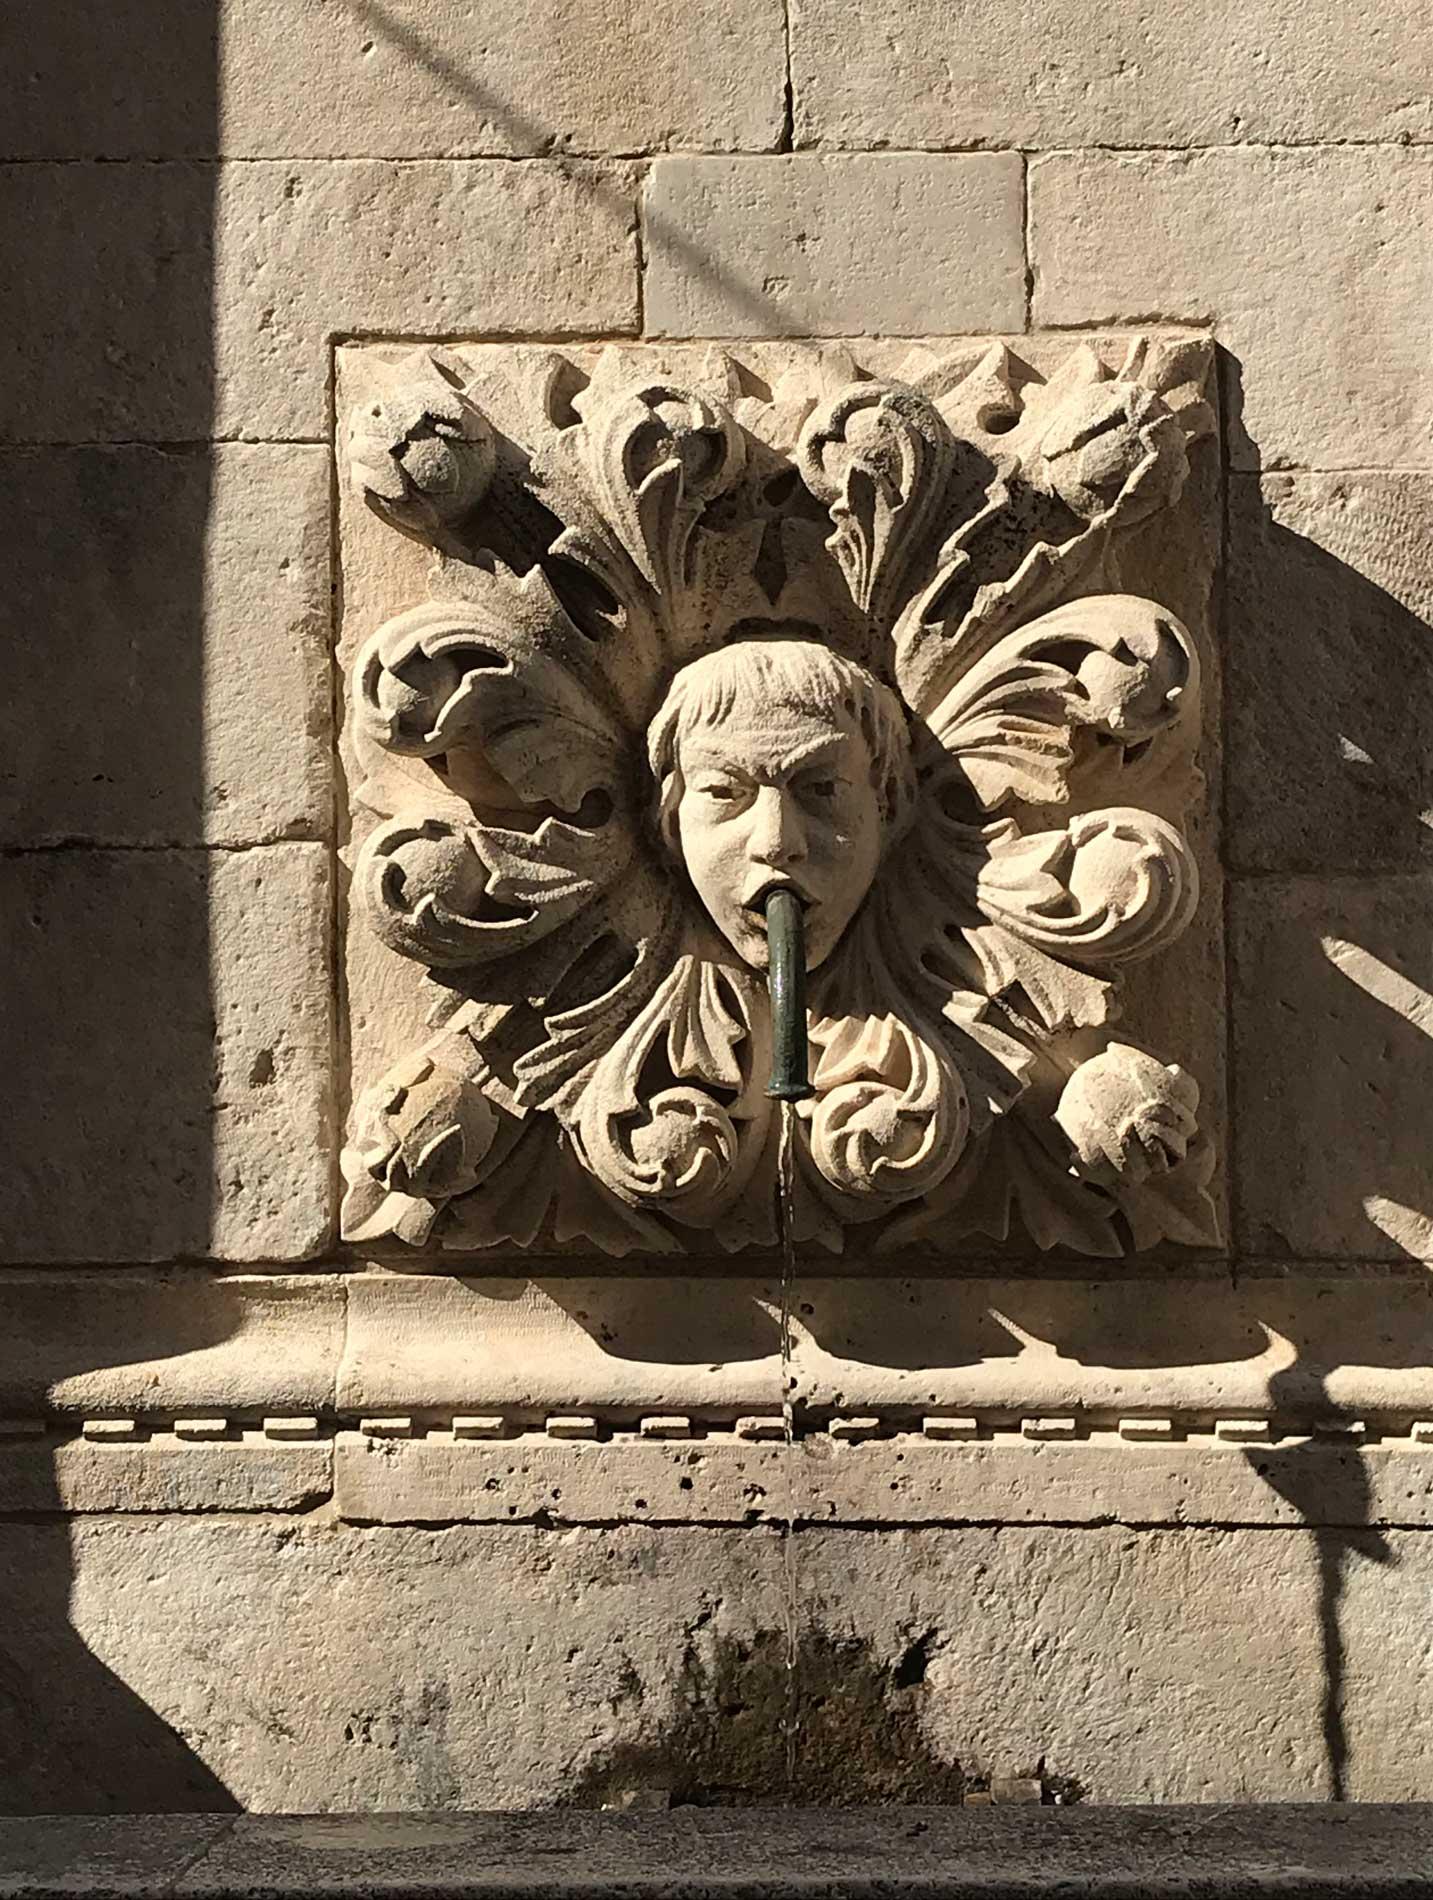 Dubrovnik-Fontana-Grande-di-Onofrio-mascherone-scolpito-acqua